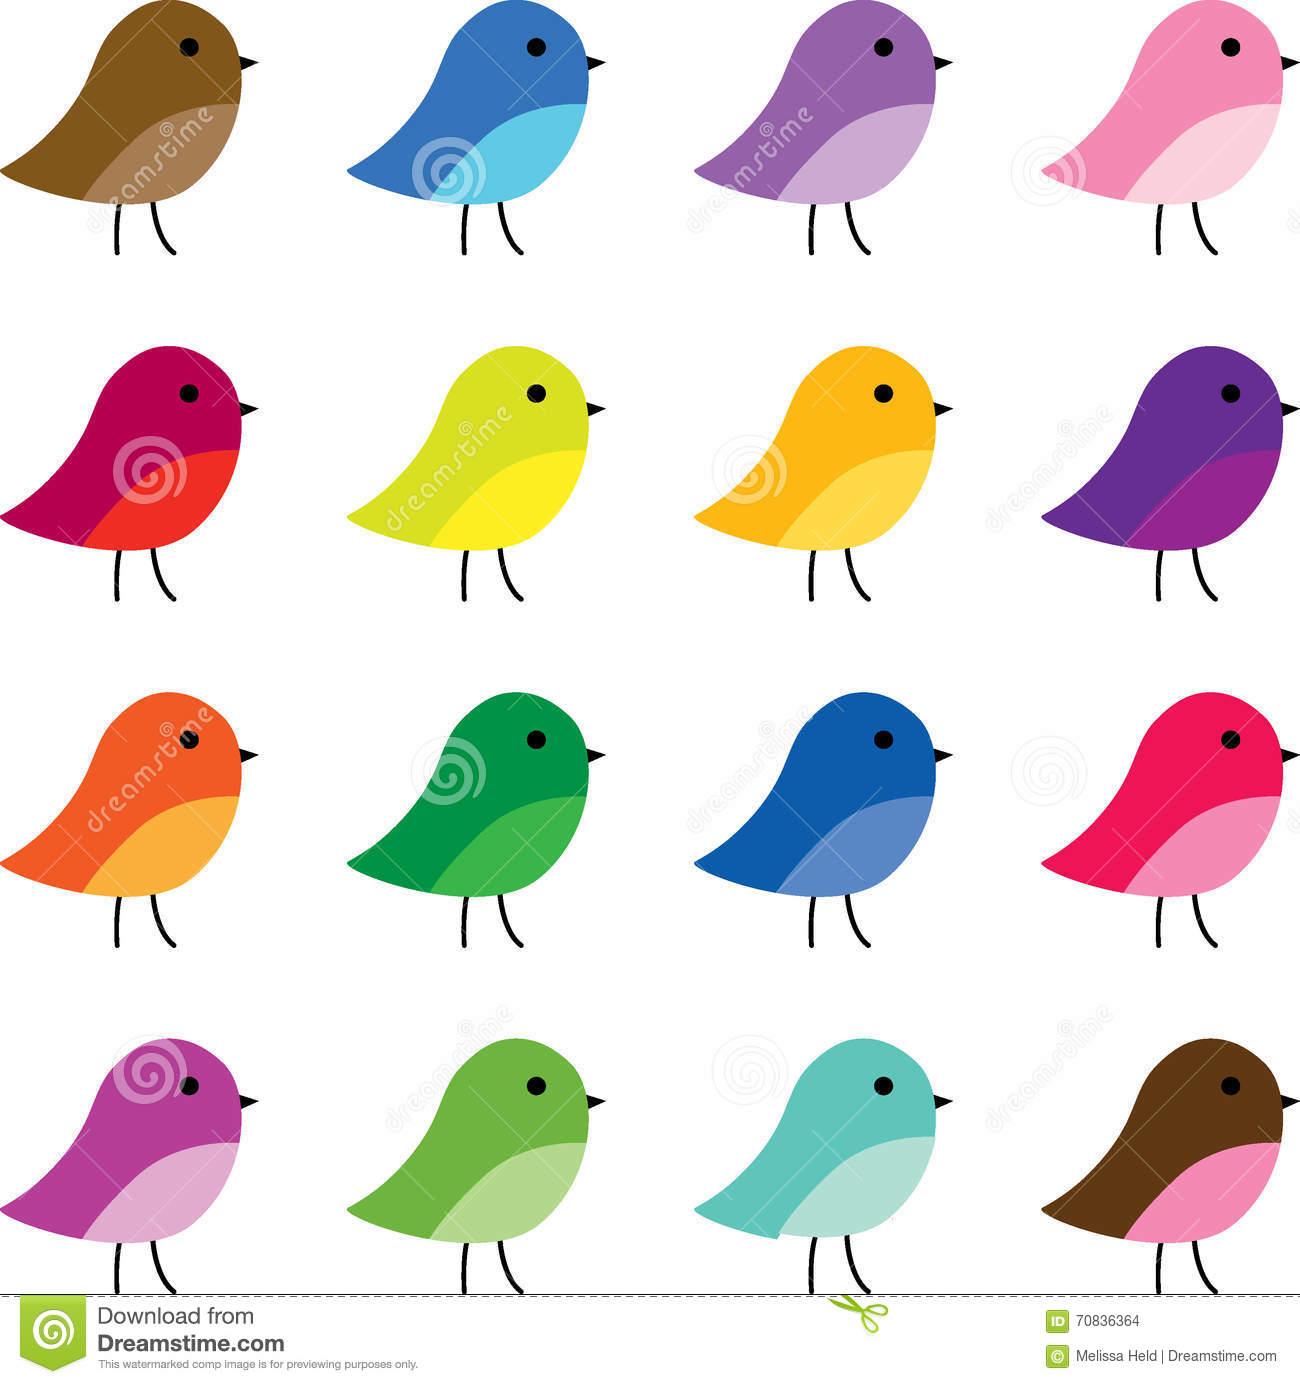 Clipart vogels.